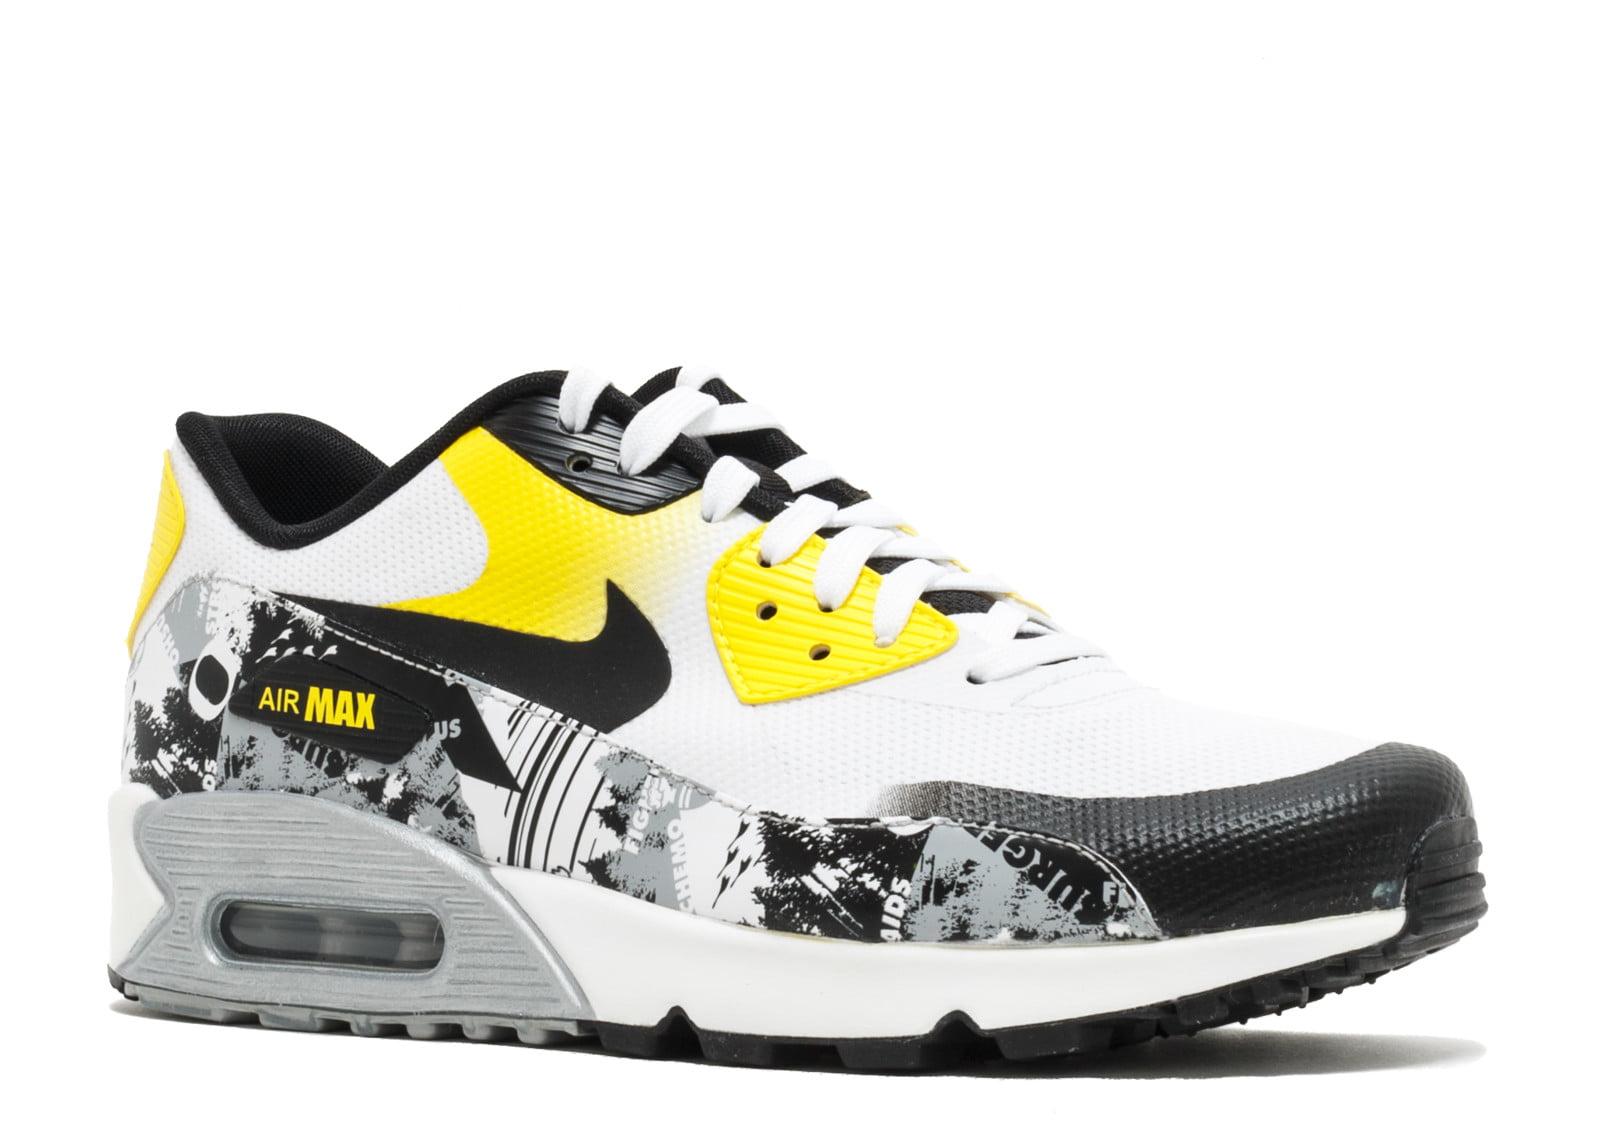 150eb97fca6b Nike - Men - Nike Air Max 90 Premium Db  Doernbecher  - Ah6830-100 - Size  7.5